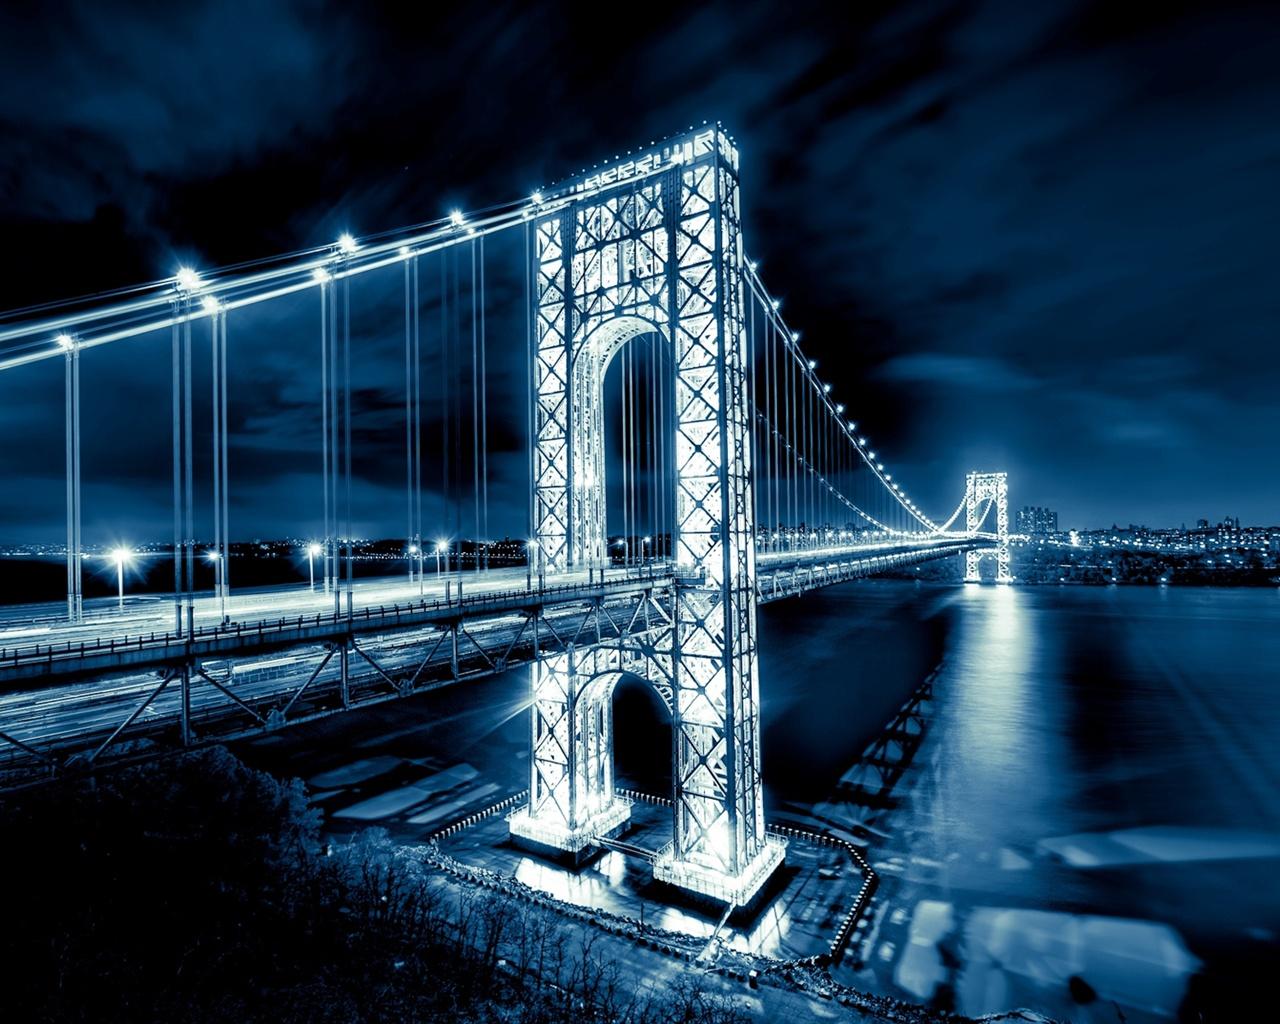 Wallpaper George Washington Bridge New Jersey Manhattan